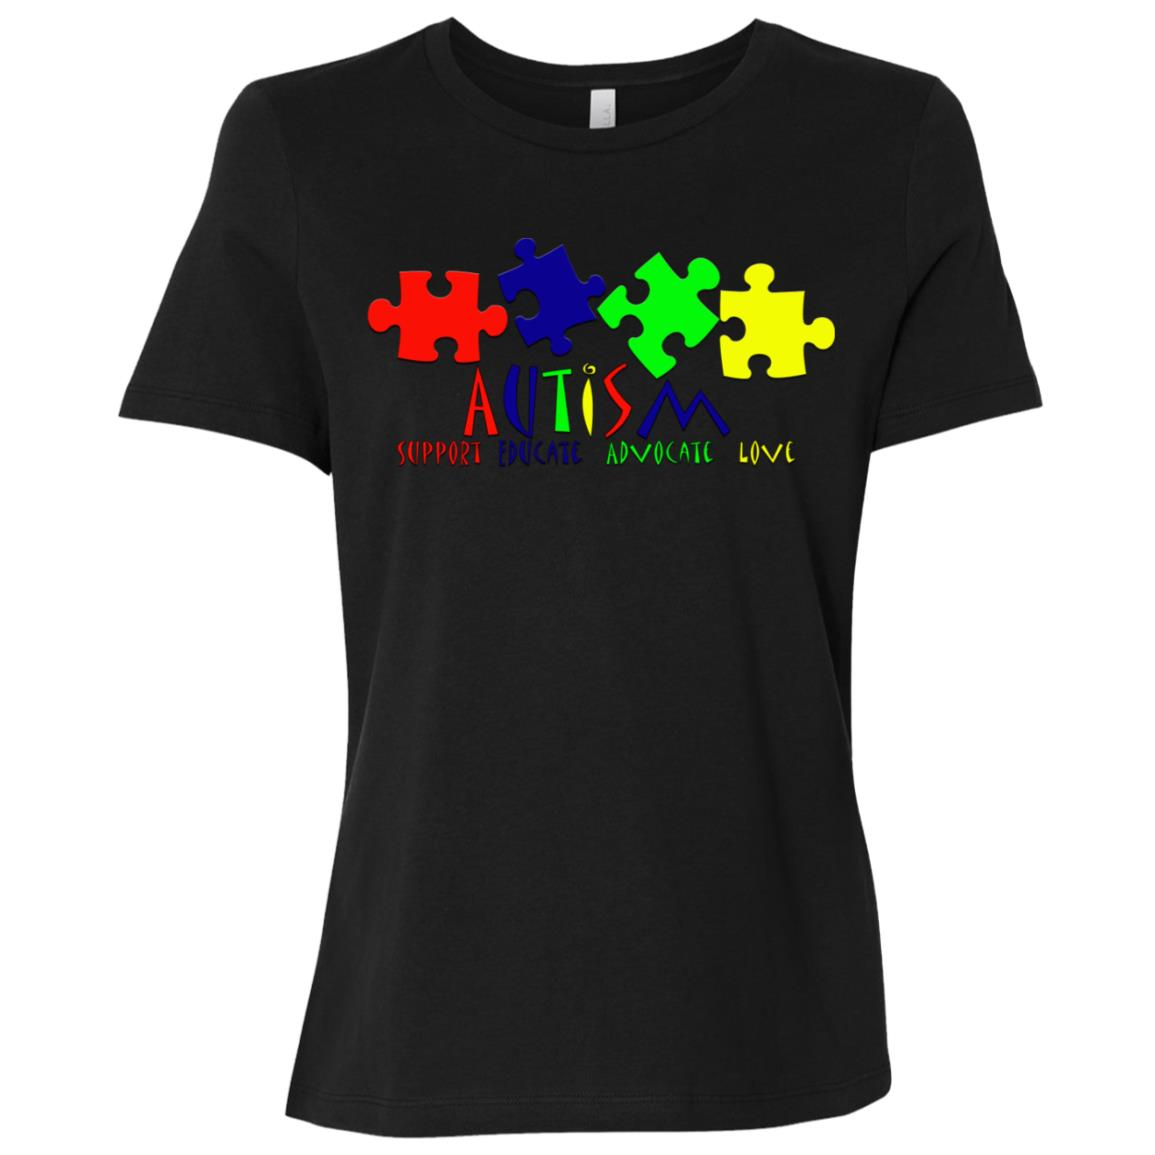 Autism Awareness Puzzle Pieces for Men Women & Kids Women Short Sleeve T-Shirt